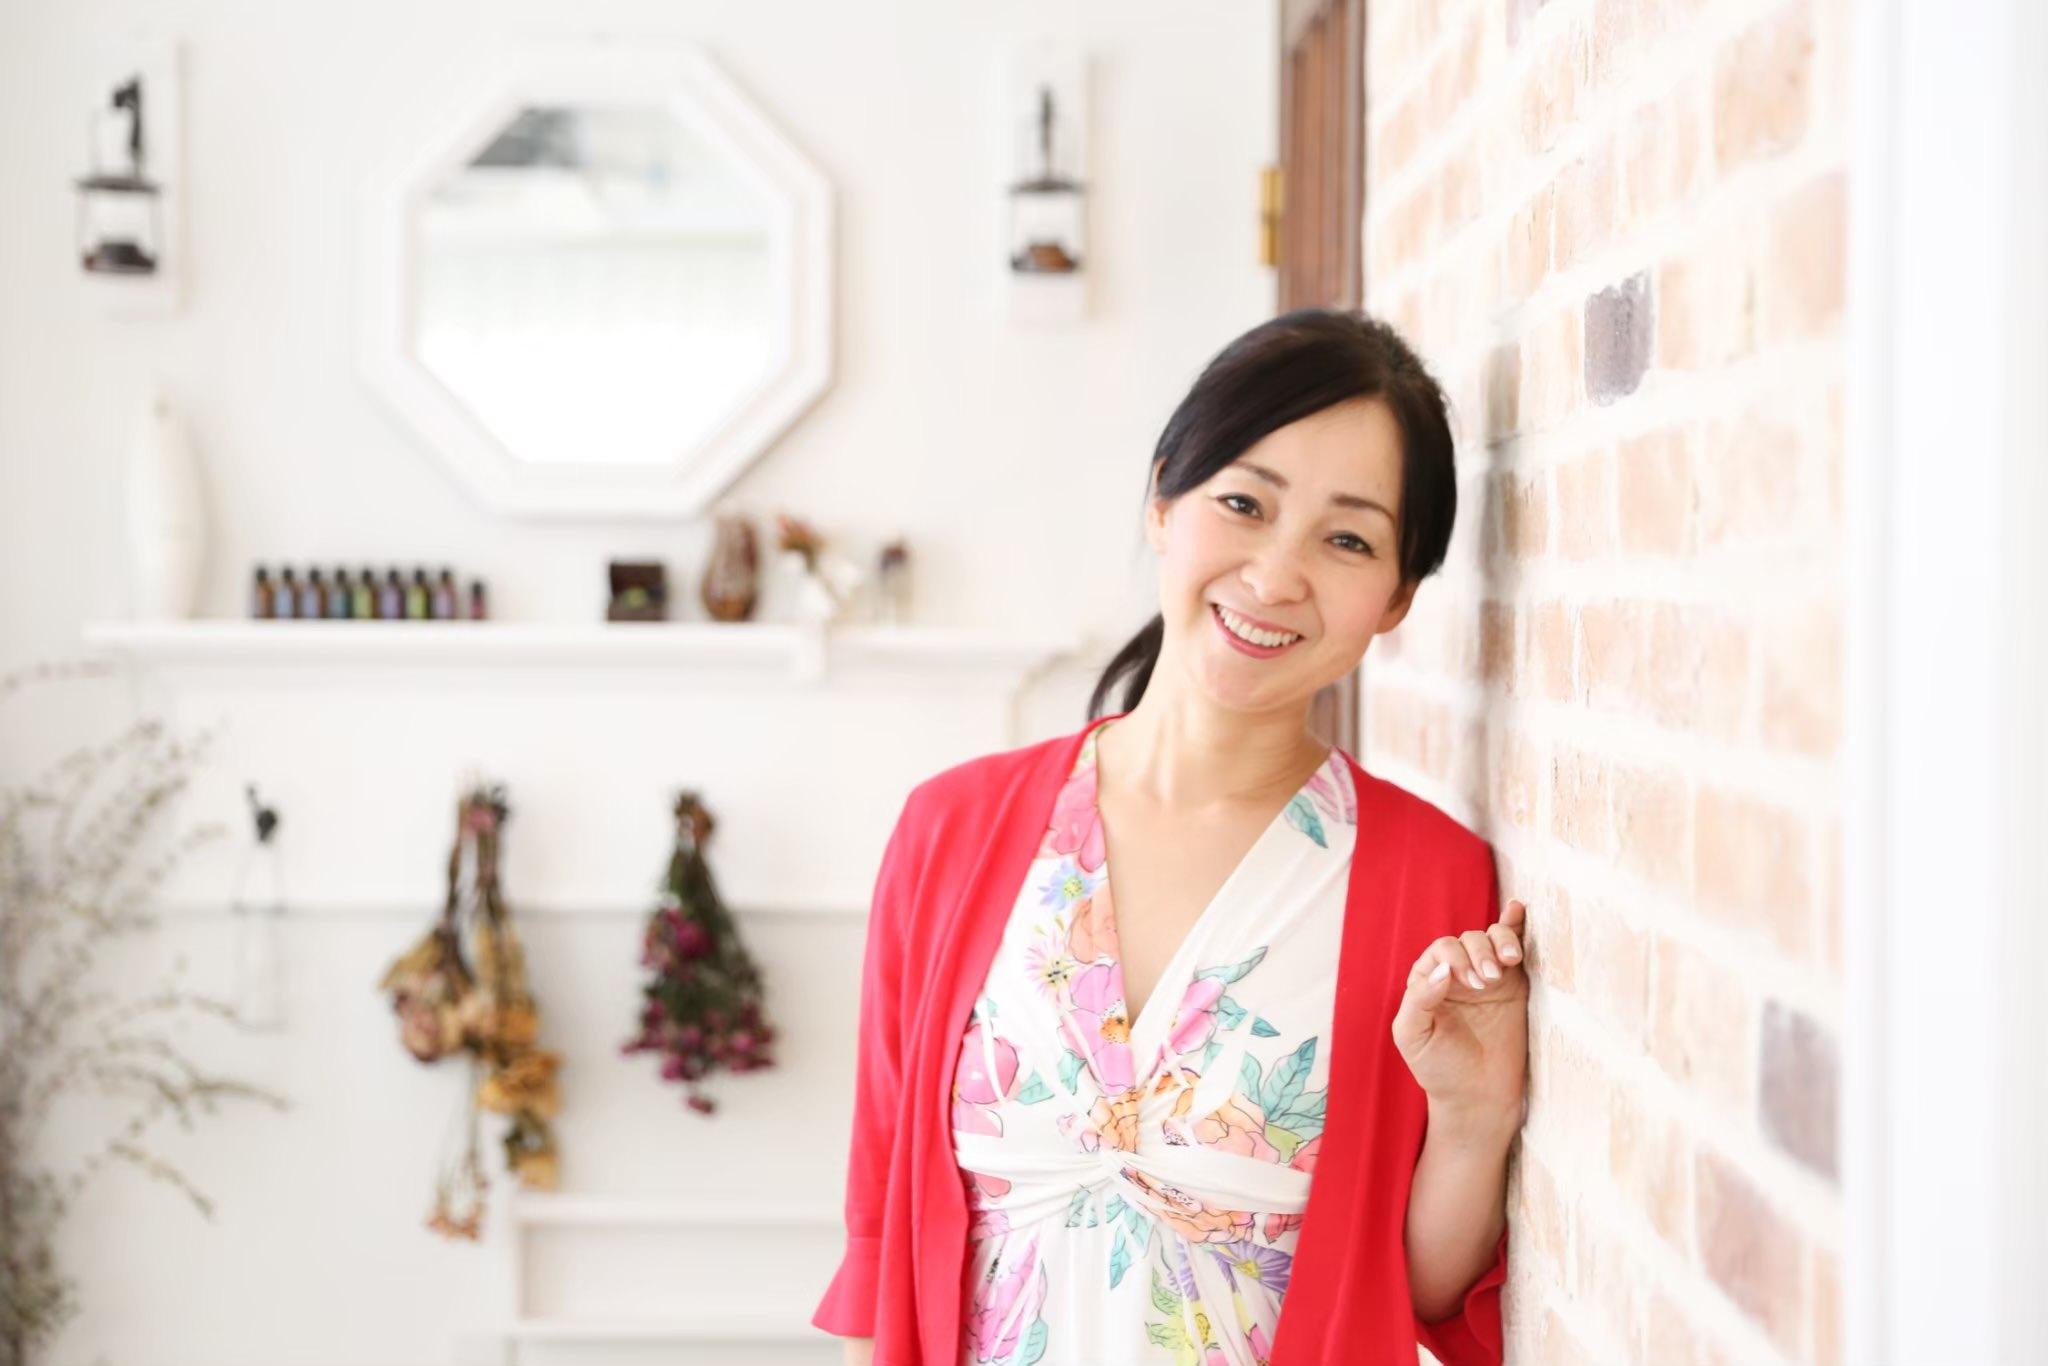 木村良子の写真